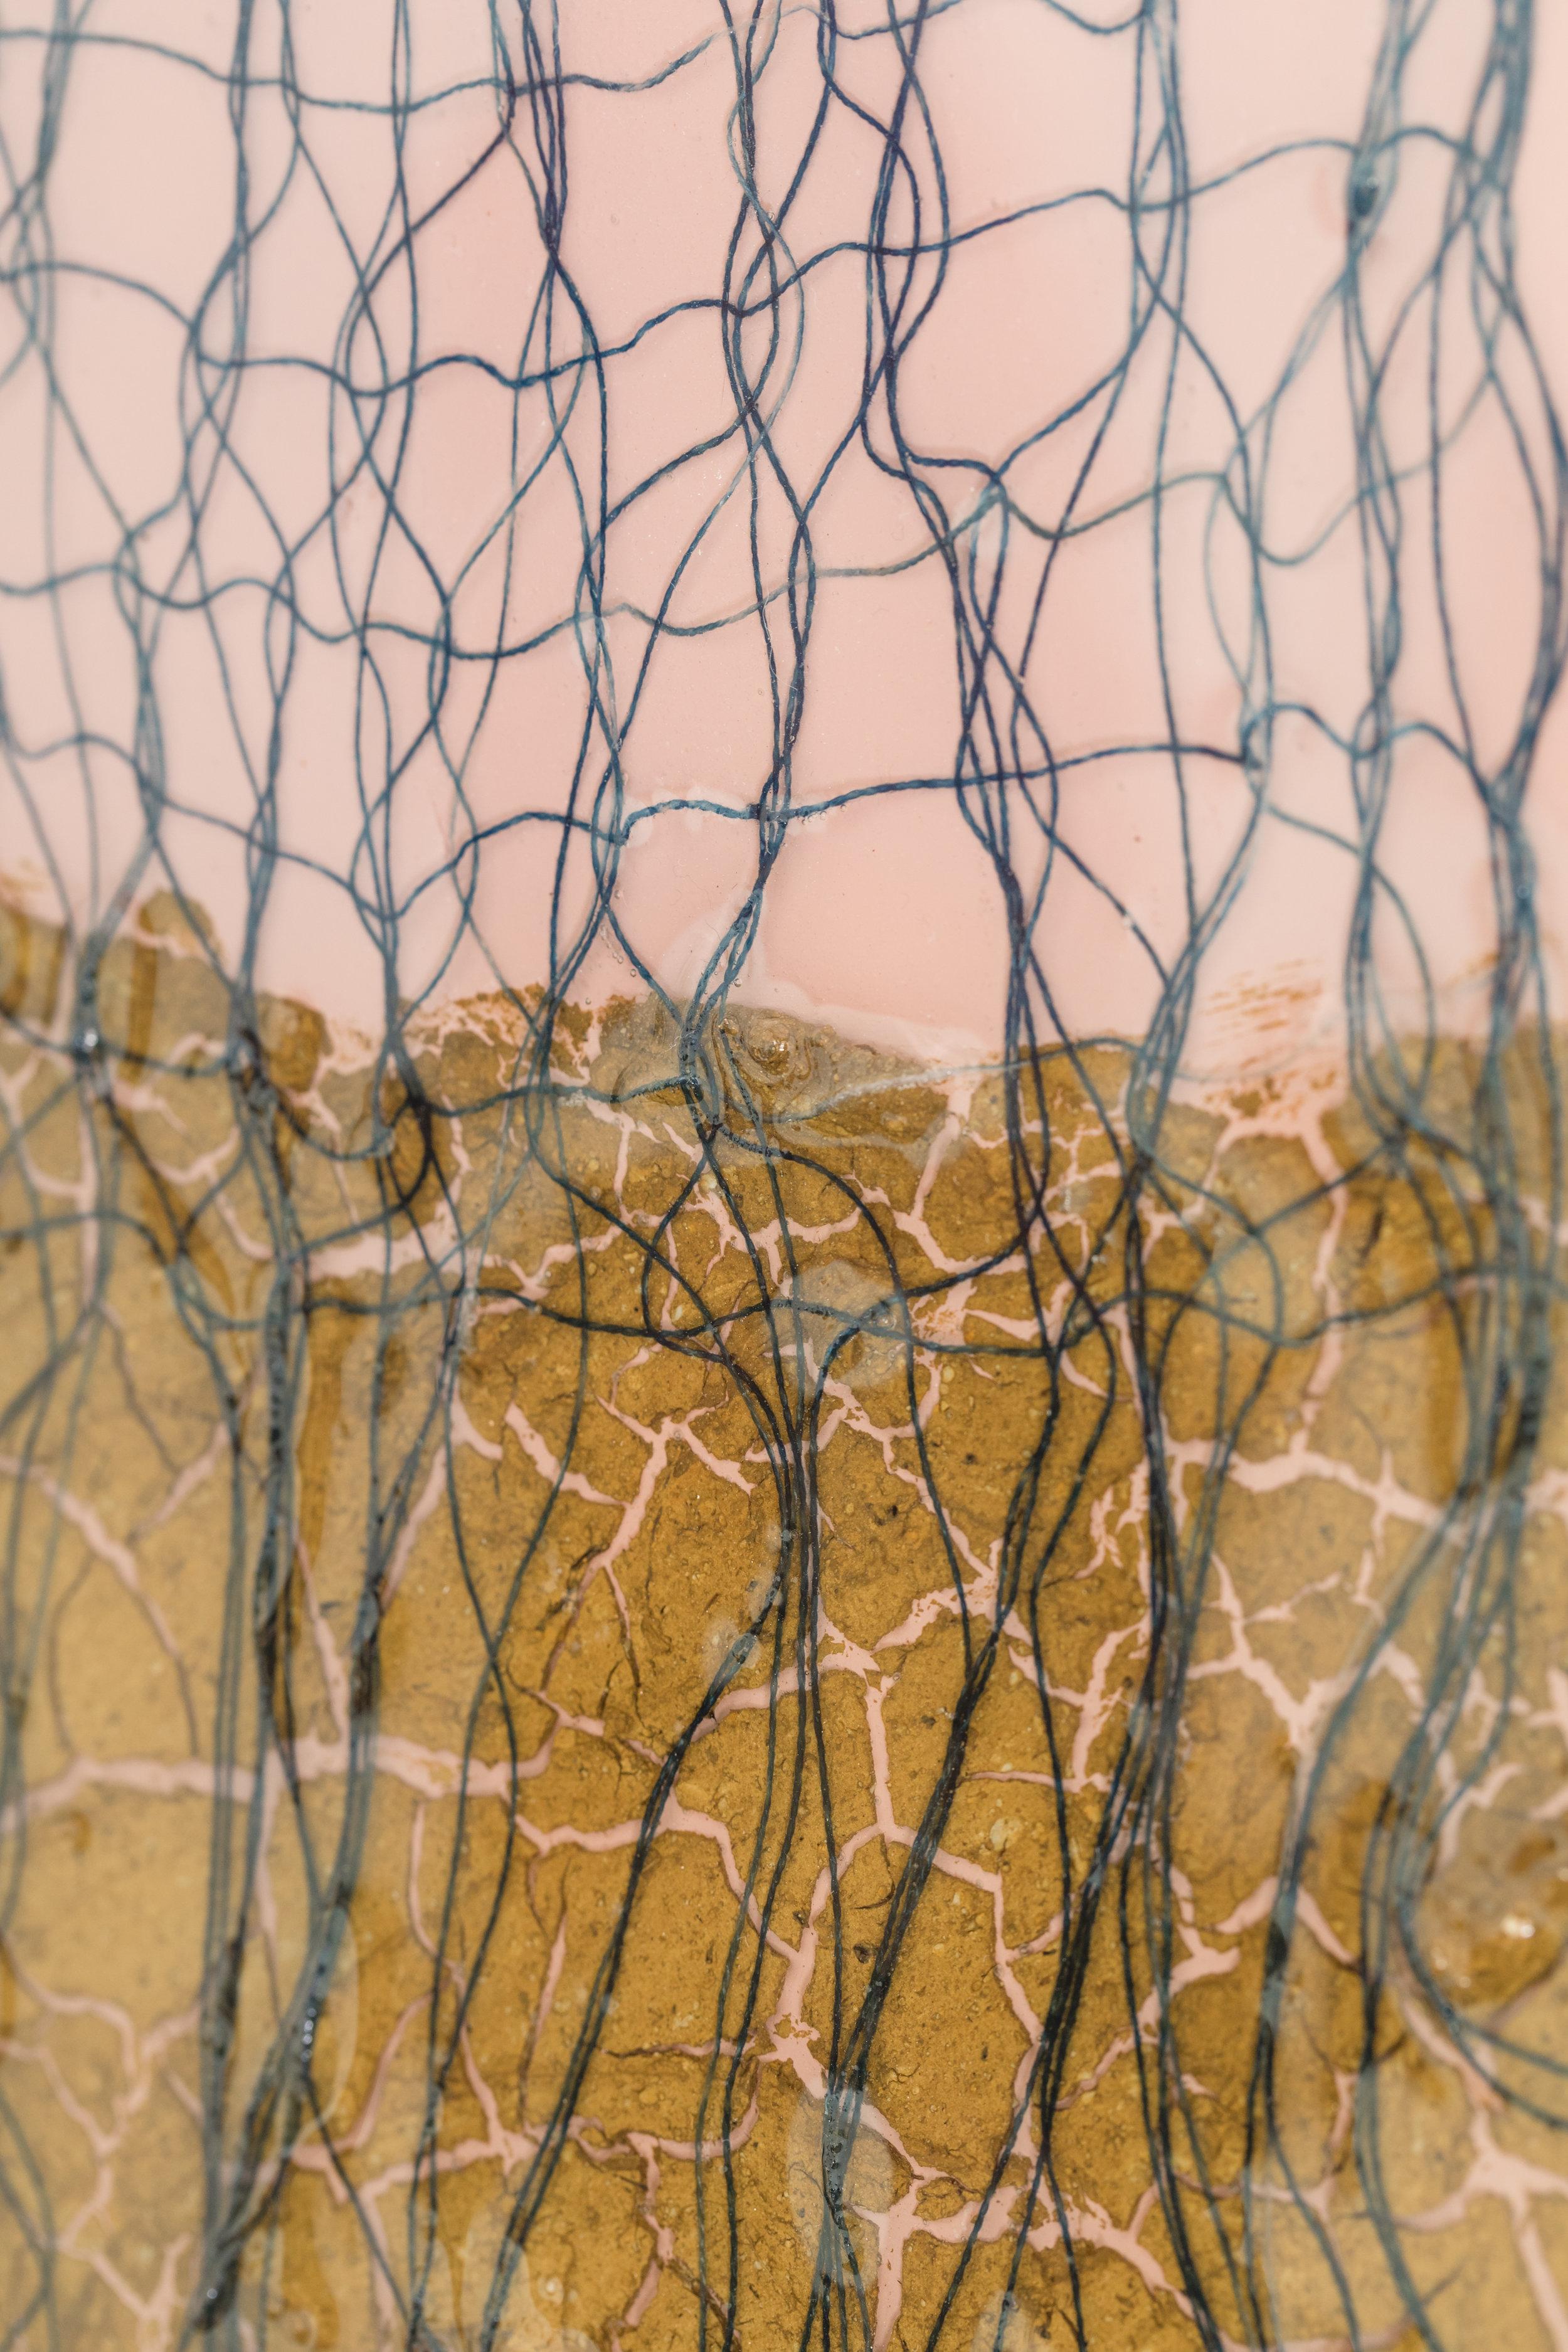 Mojave Sunset (detail)  , 2017, cotton, indigo, sand, spray paint on wood panel, 24 x 30 inches